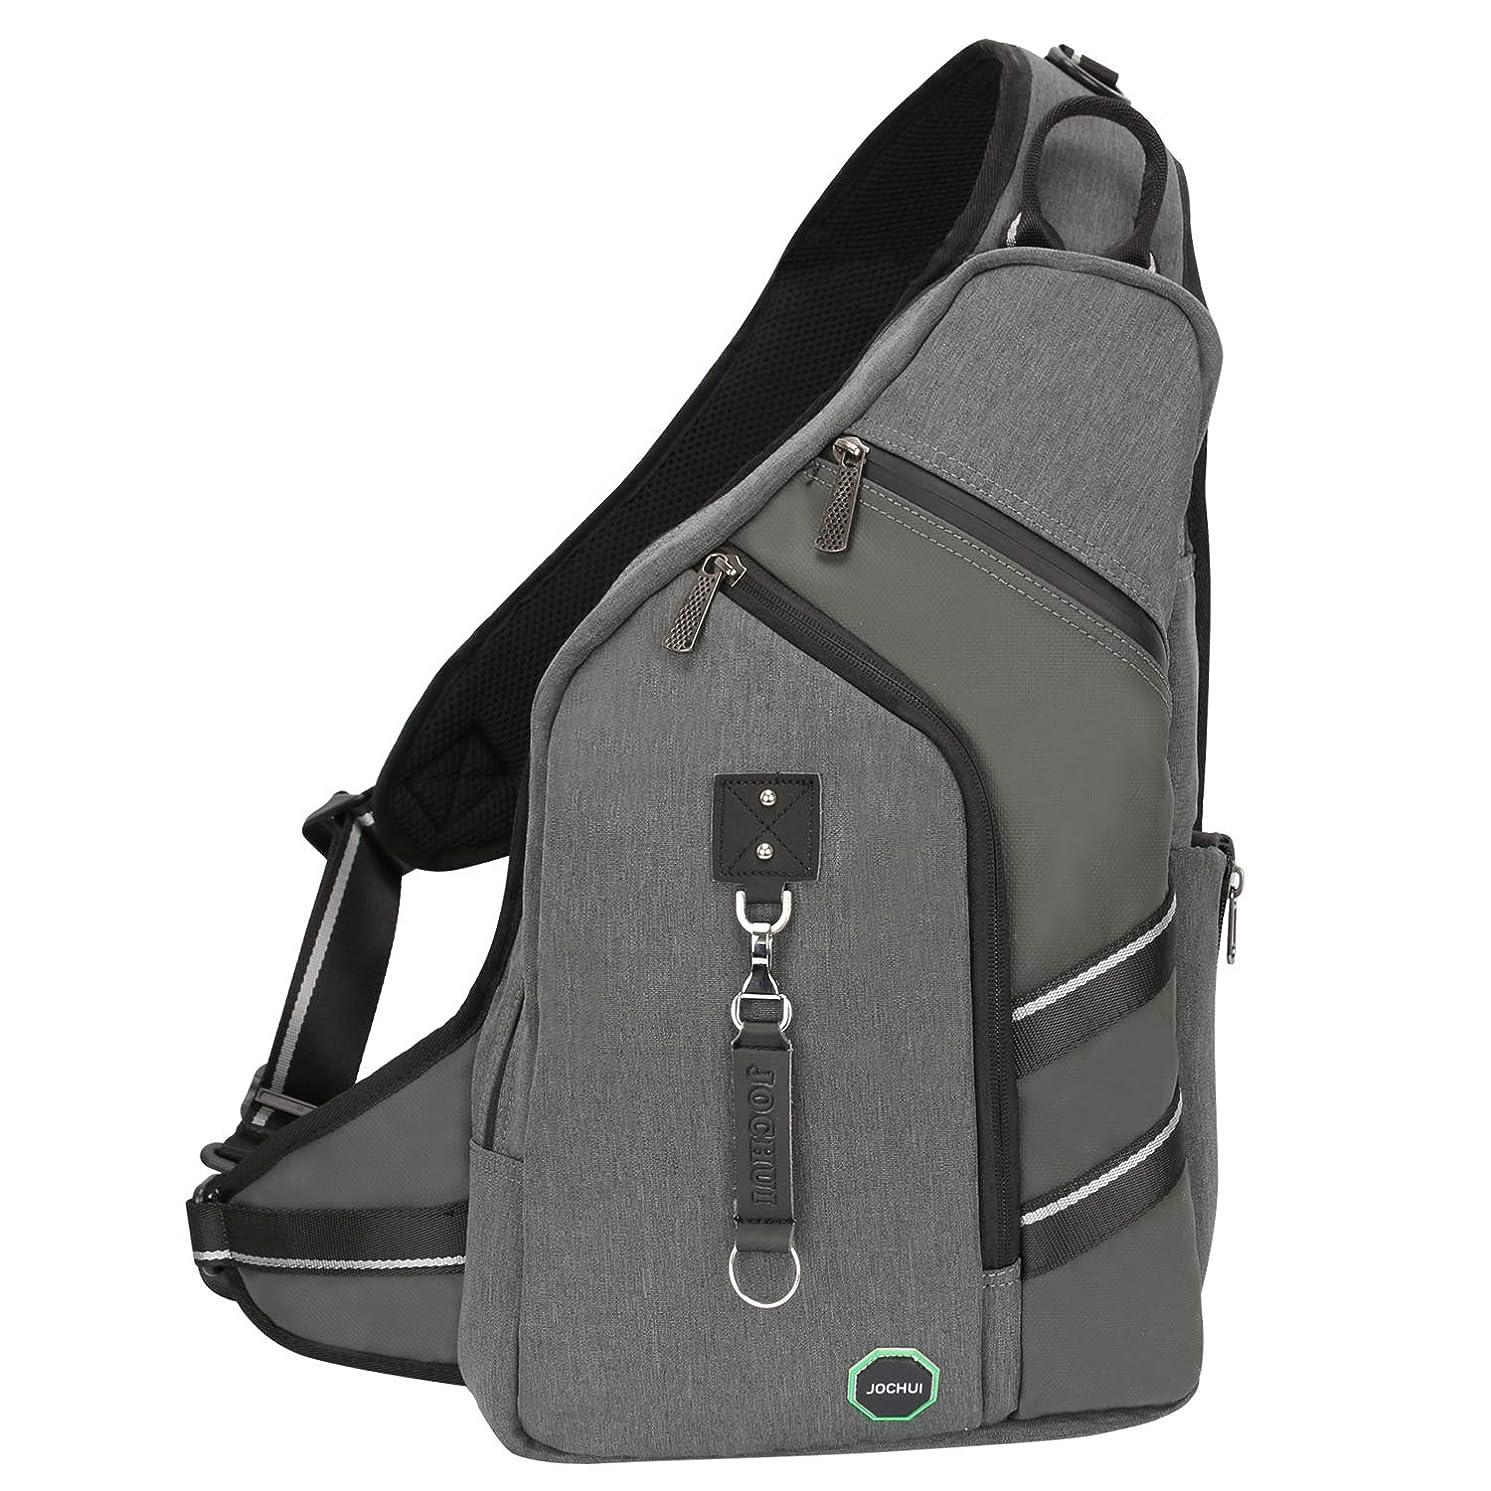 Sling Backpacks, JOCHUI Crossbody Bags for Men Women Sling Bags Purse Backpack for Travel Gym Cycling Hiking Gray